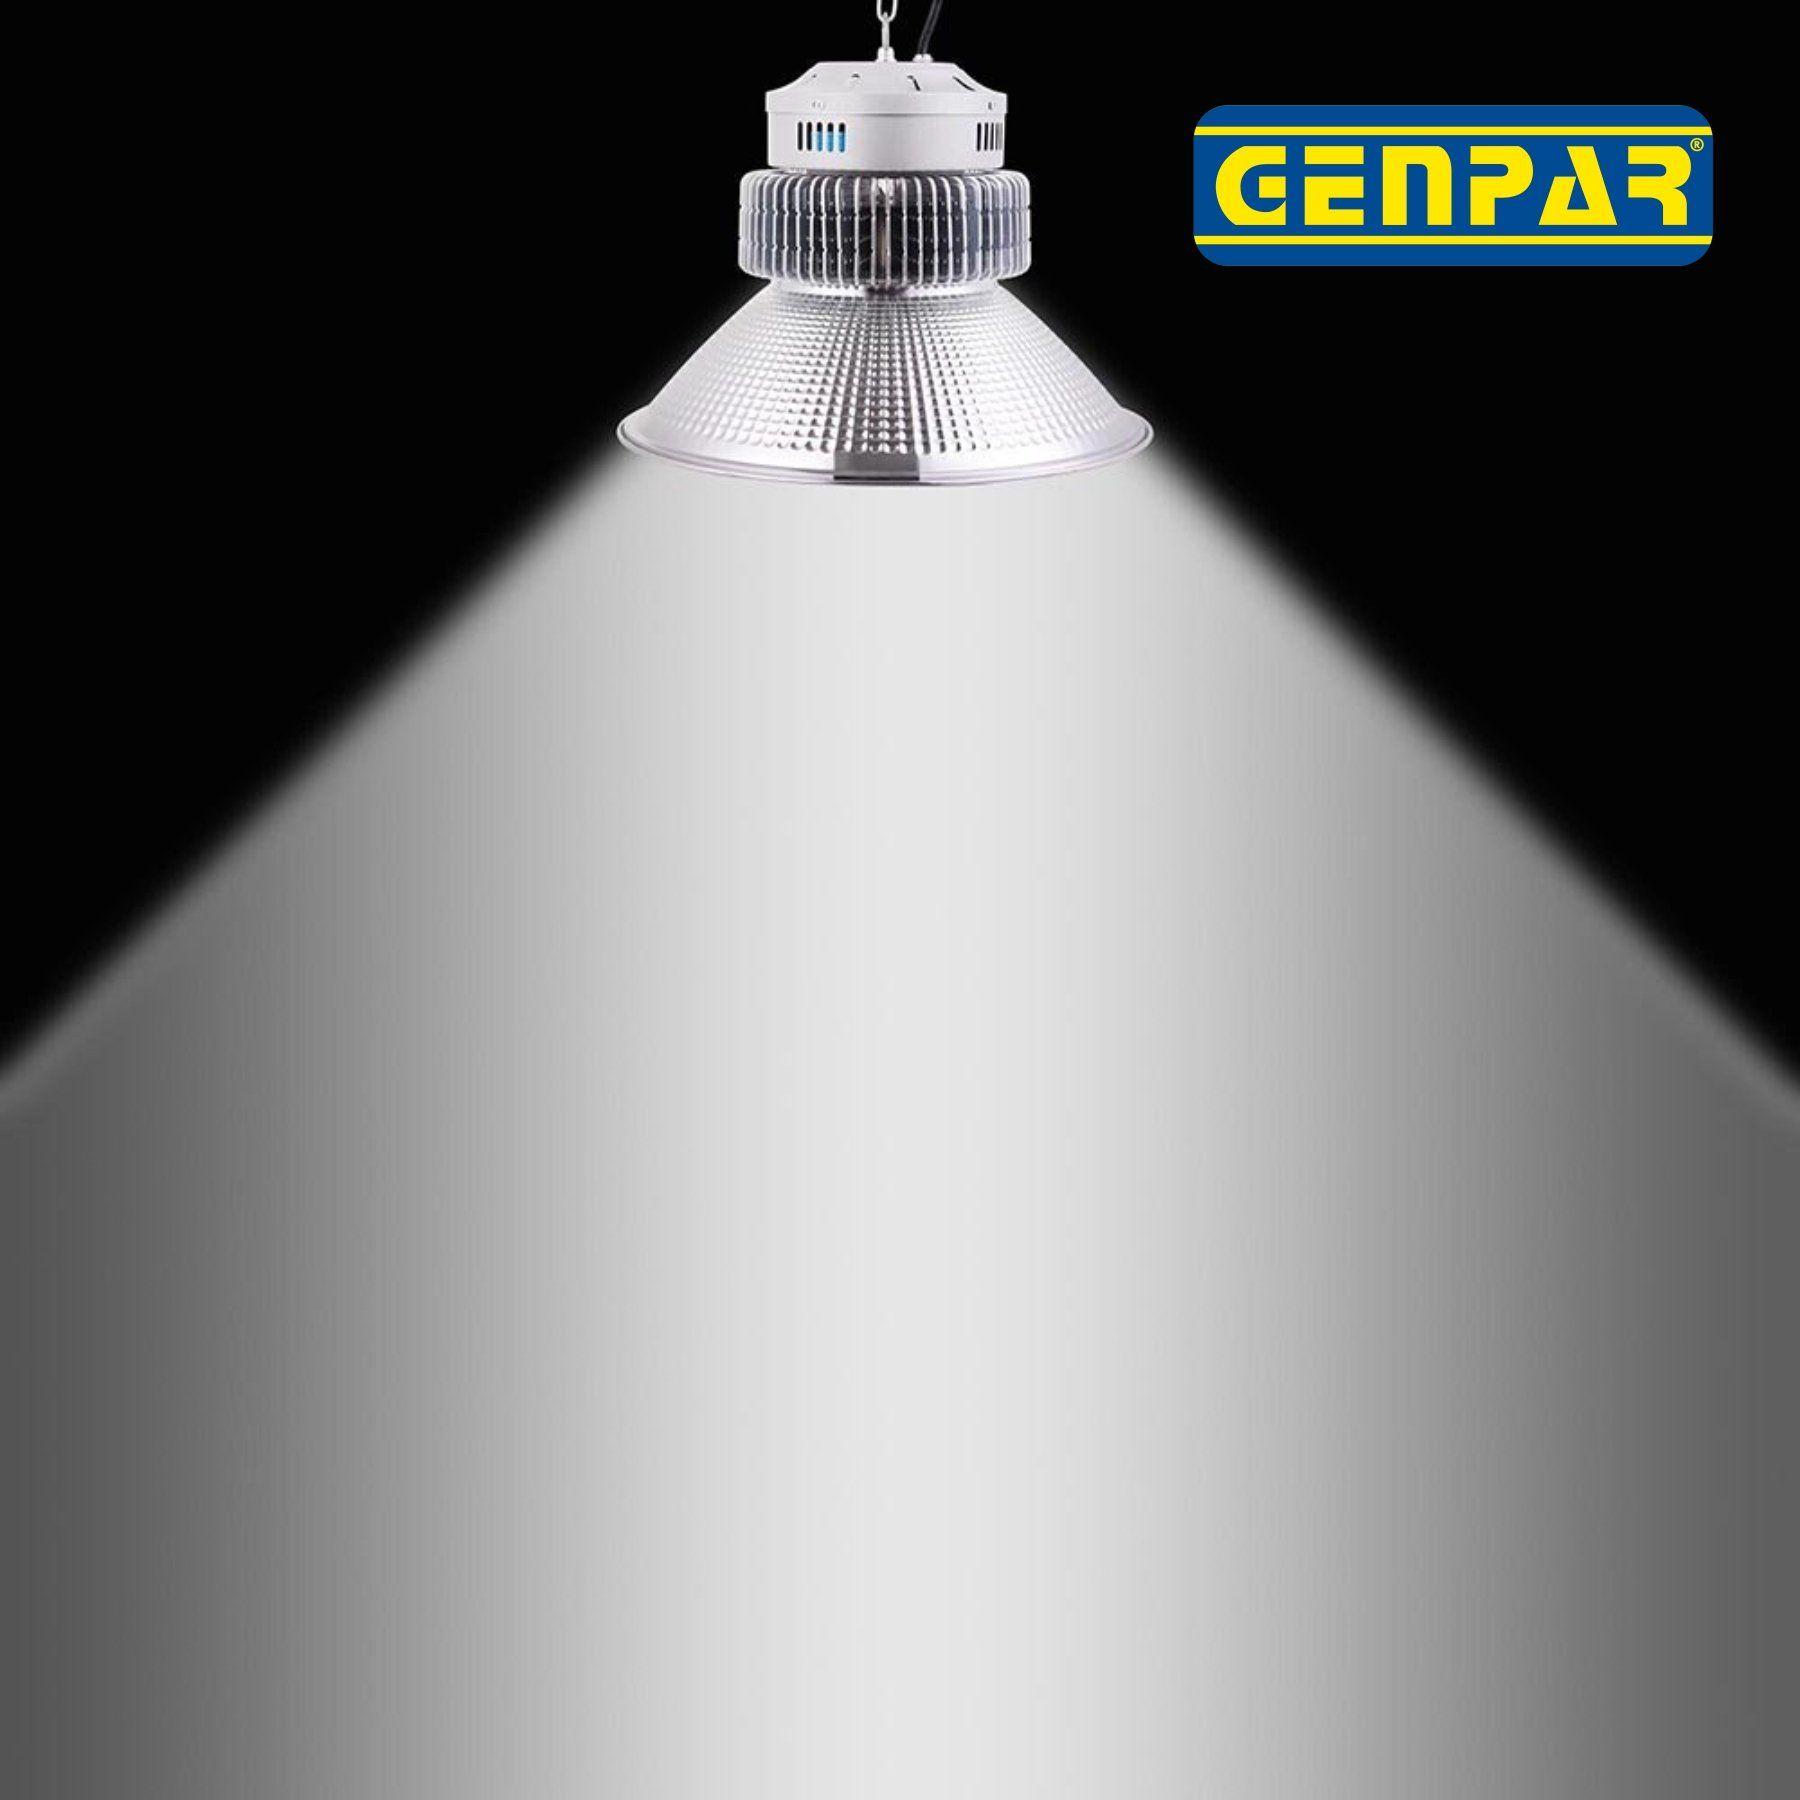 Genpar 200w High Bay Led Lighting Commercial Warehouse Hanging